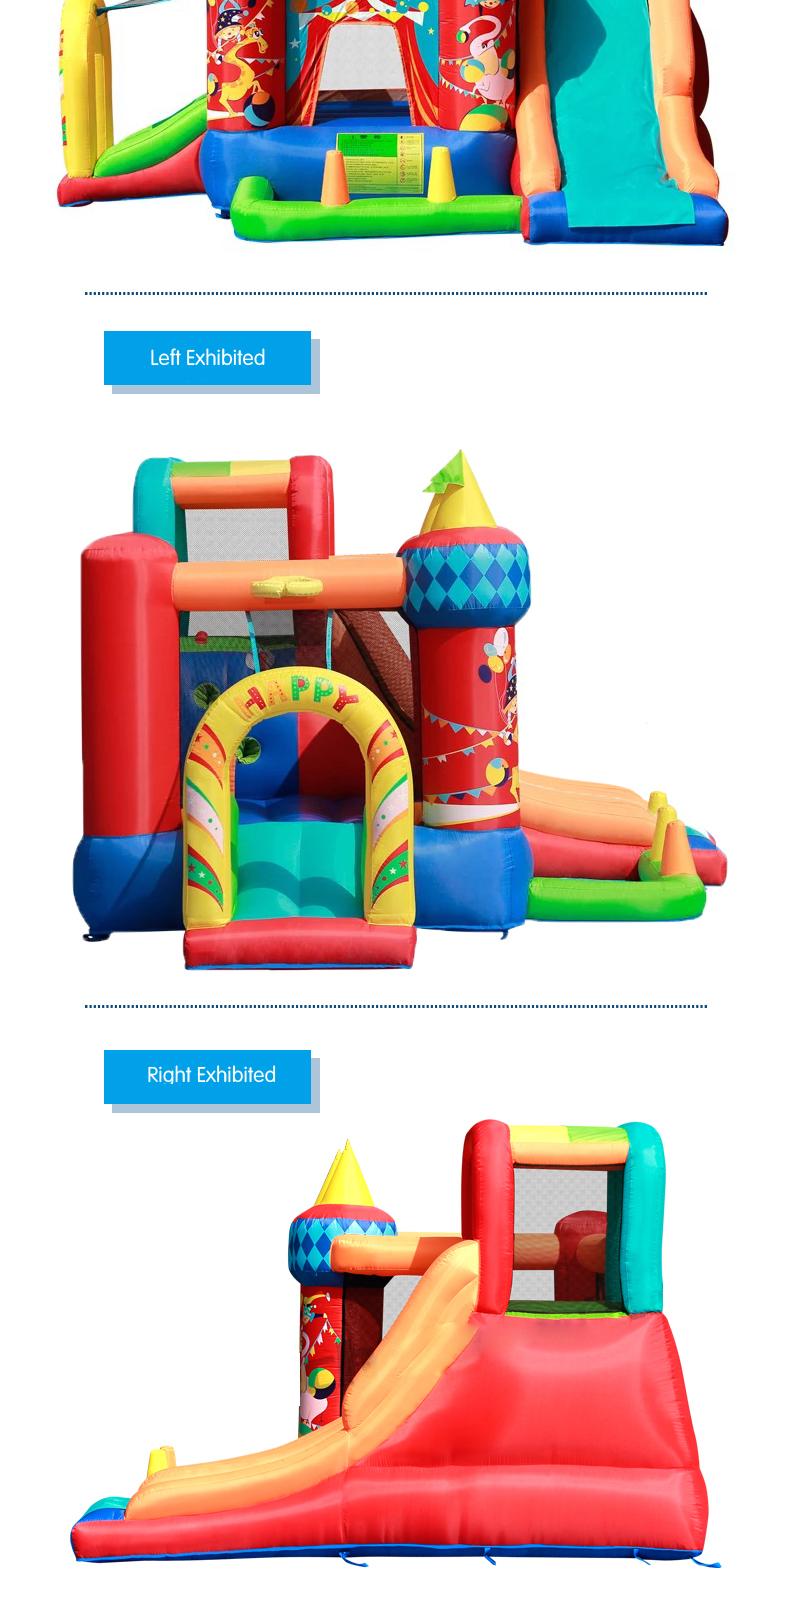 HTB1M85jPFXXXXbbXpXXq6xXFXXXW - Mr. Fun Residential Nylon PVC Inflatable Bounce Castle Bouncy House with Blower